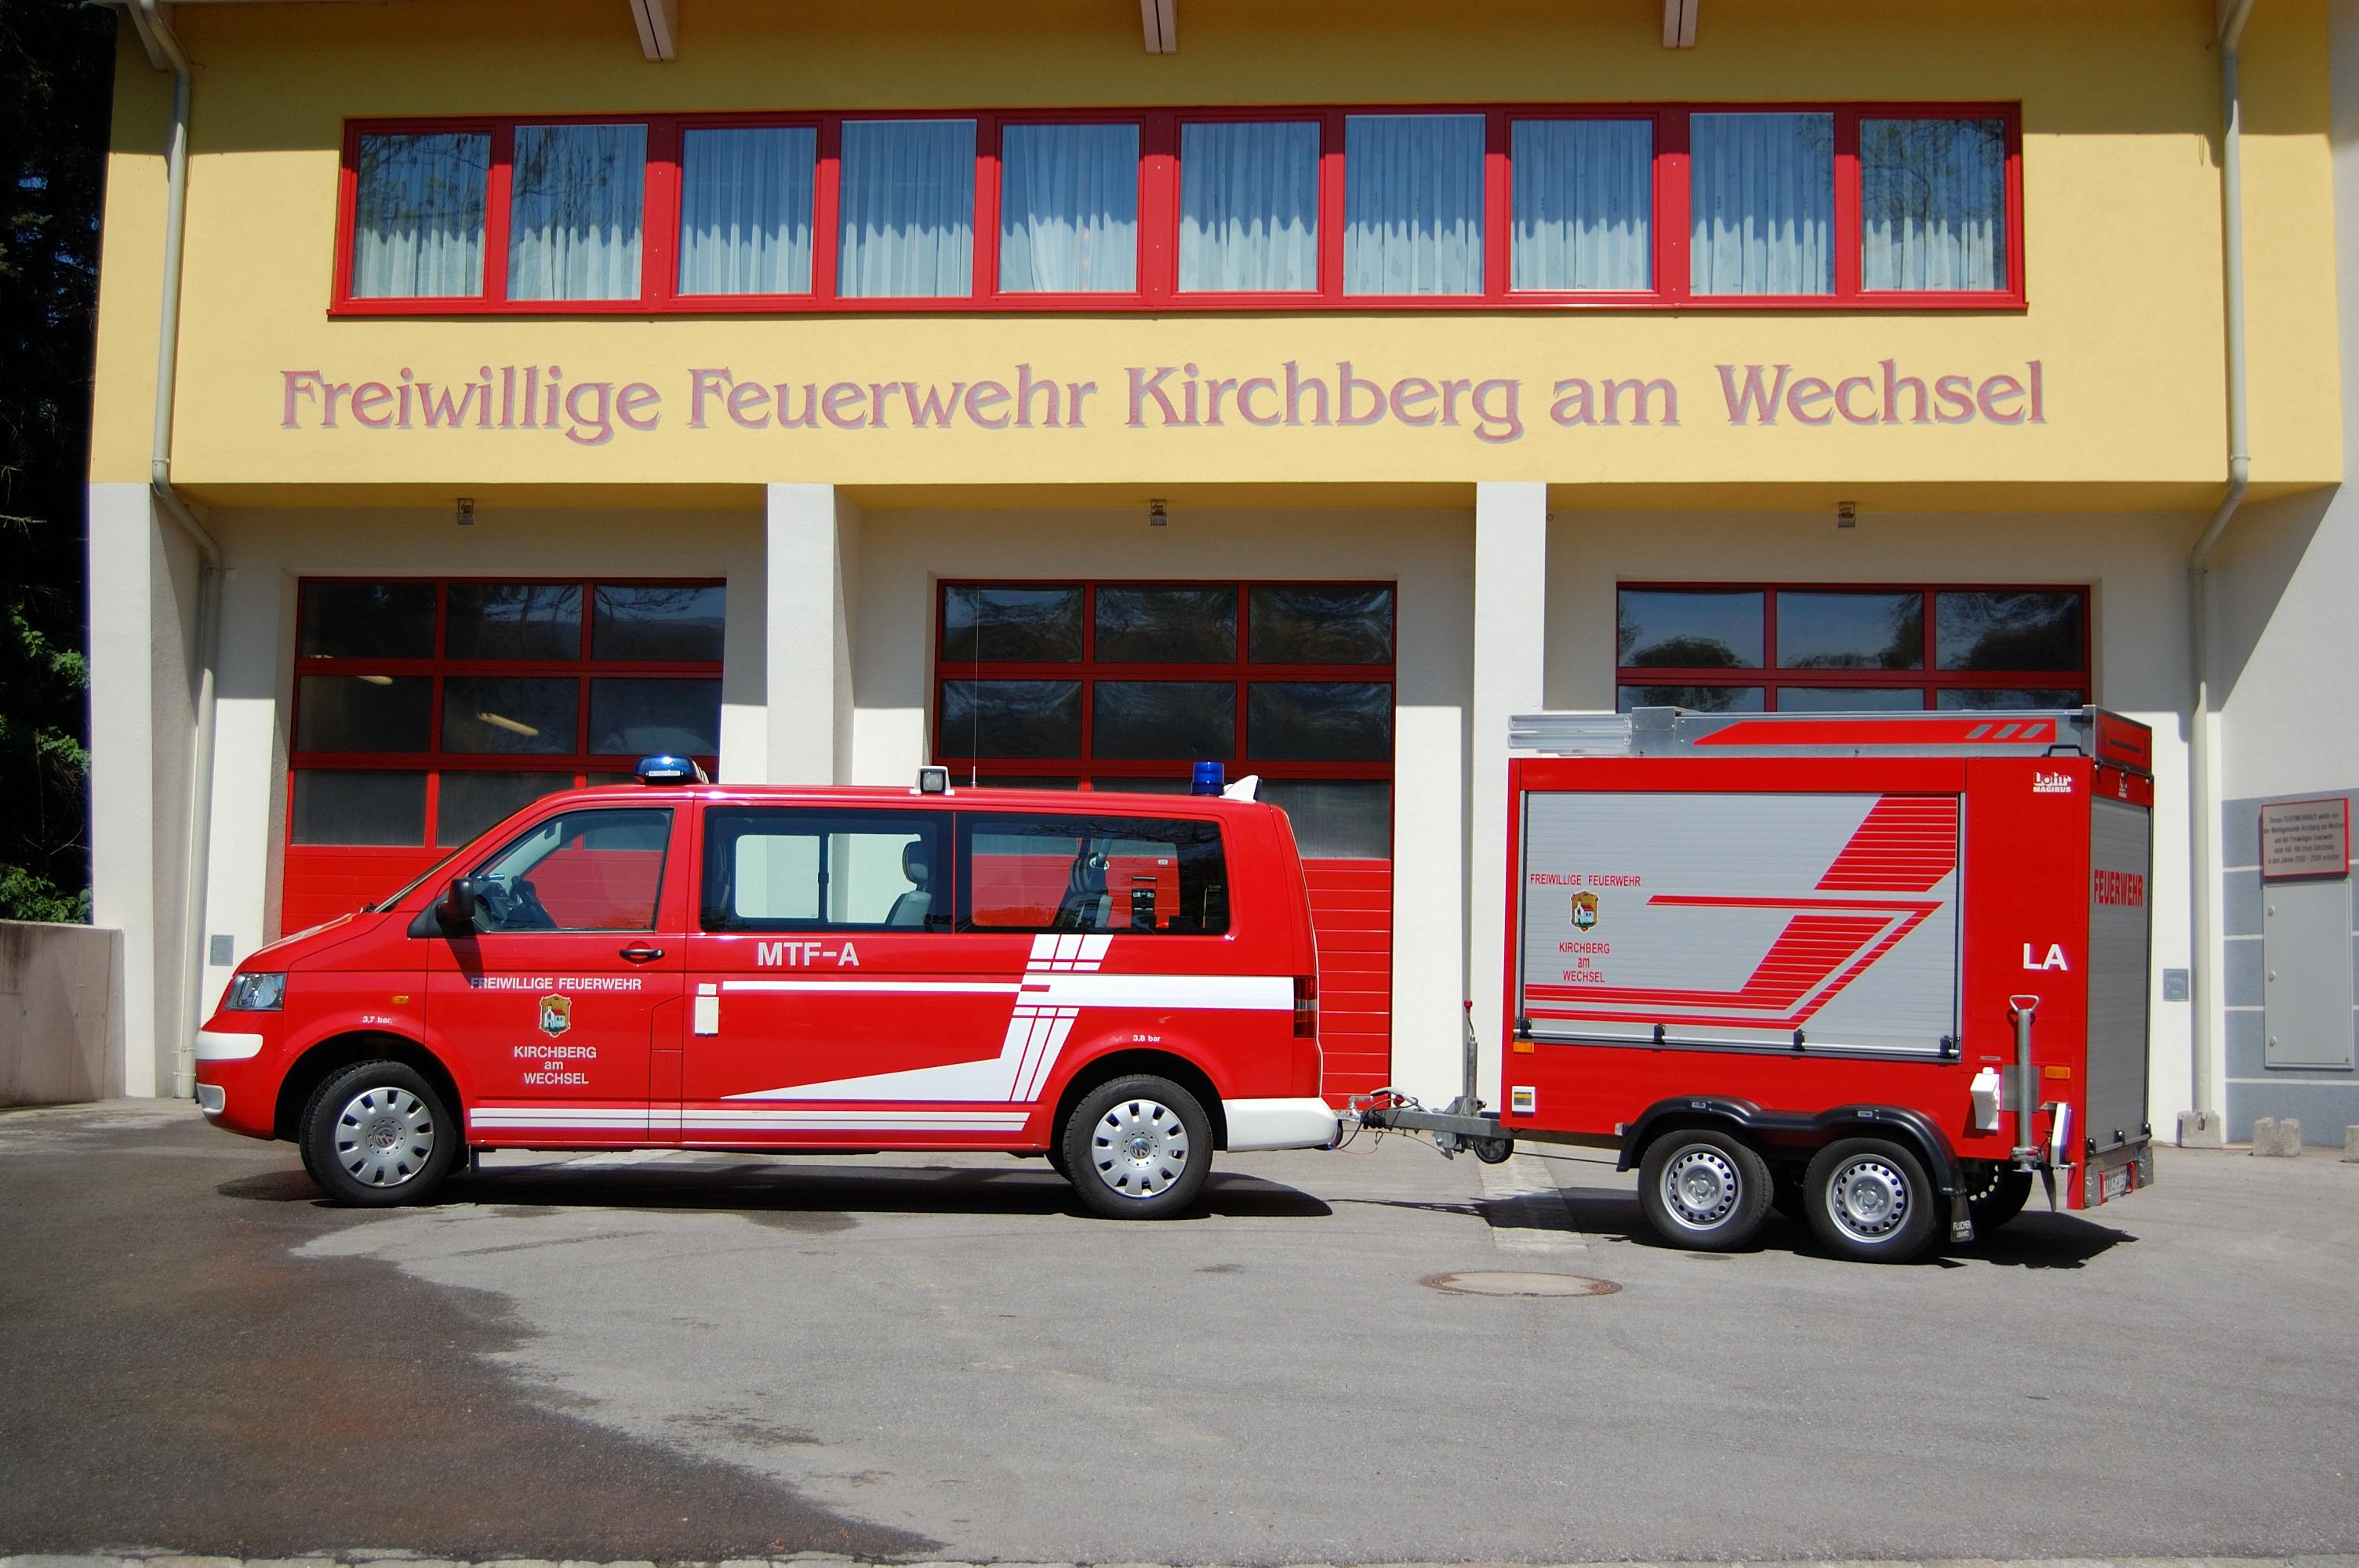 Mannschafts-Transport-Fahrzeug-Allrad (MTF-A) + Löschanhänger (LA)